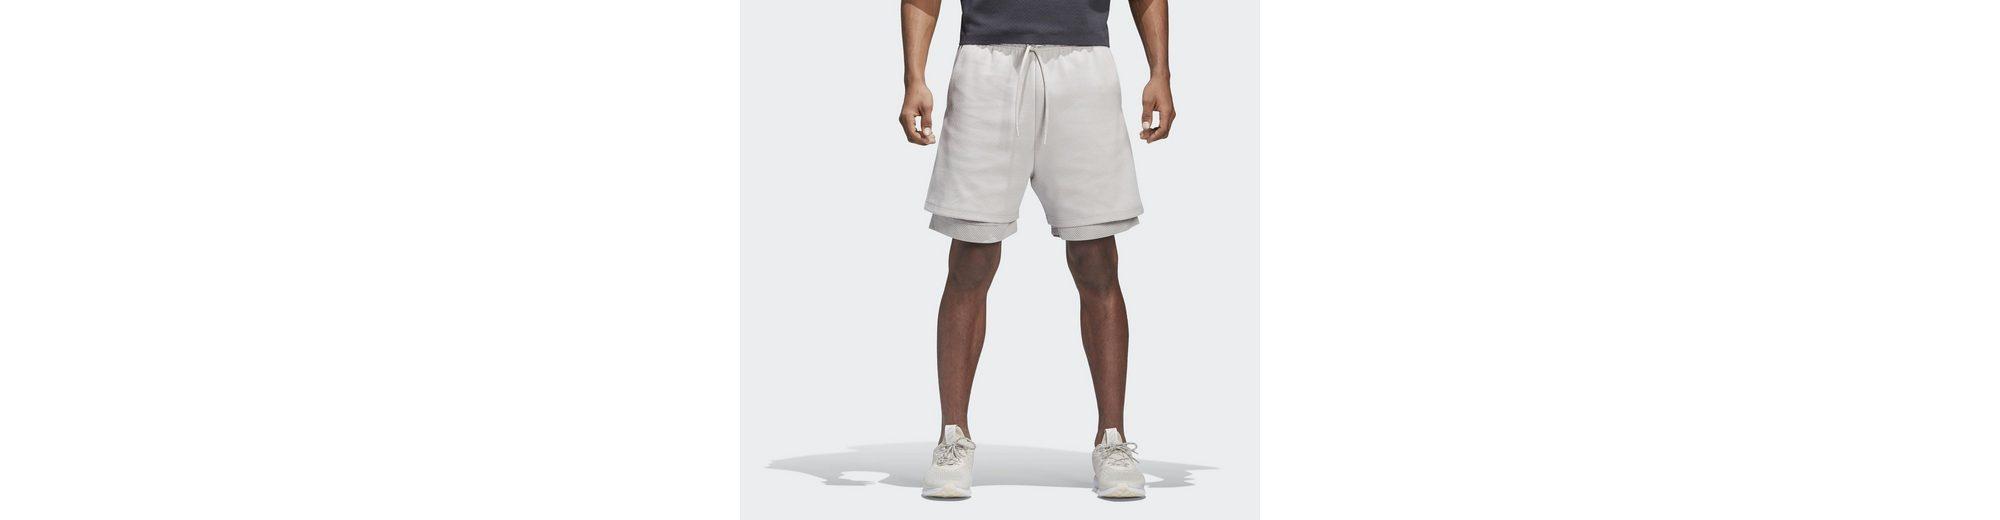 adidas Performance Shorts ID Reversible Shorts